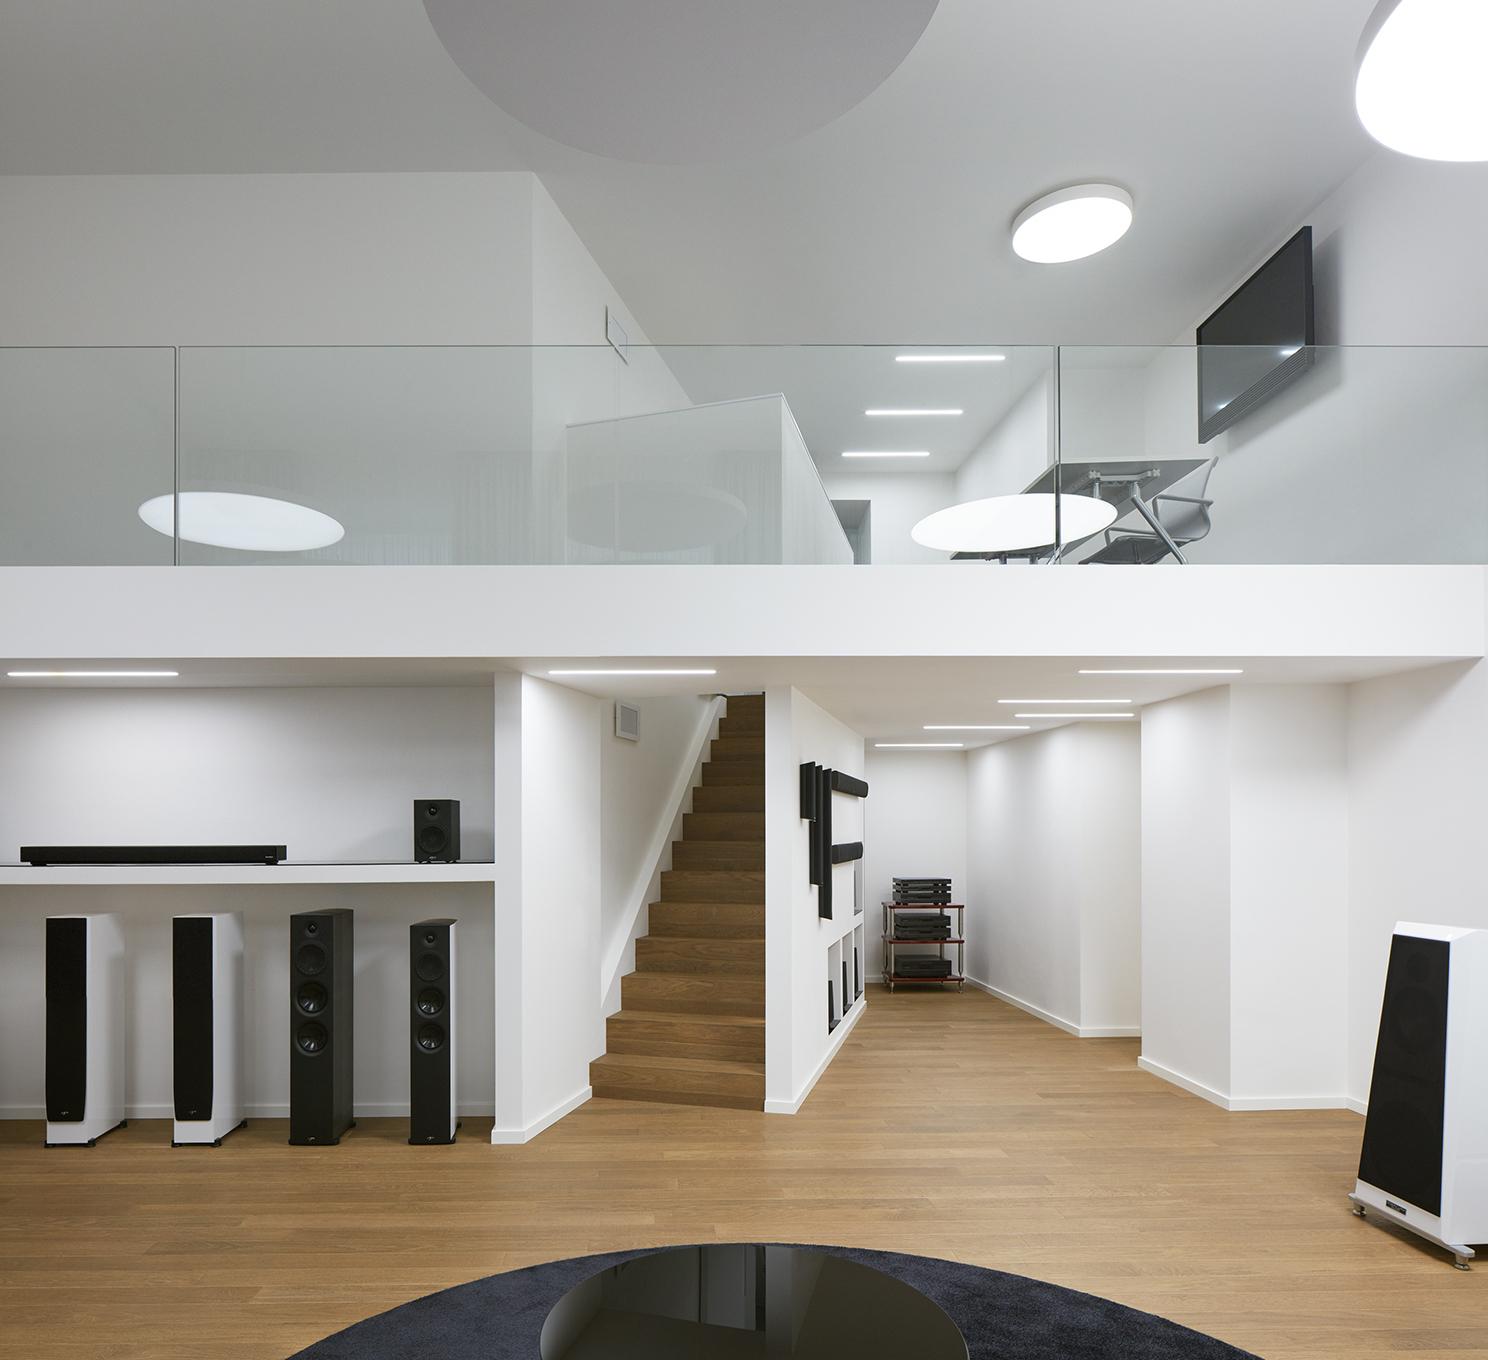 VOIX_BoysPlayNice_12_Barbora_Leblova_Interiors_Architecture